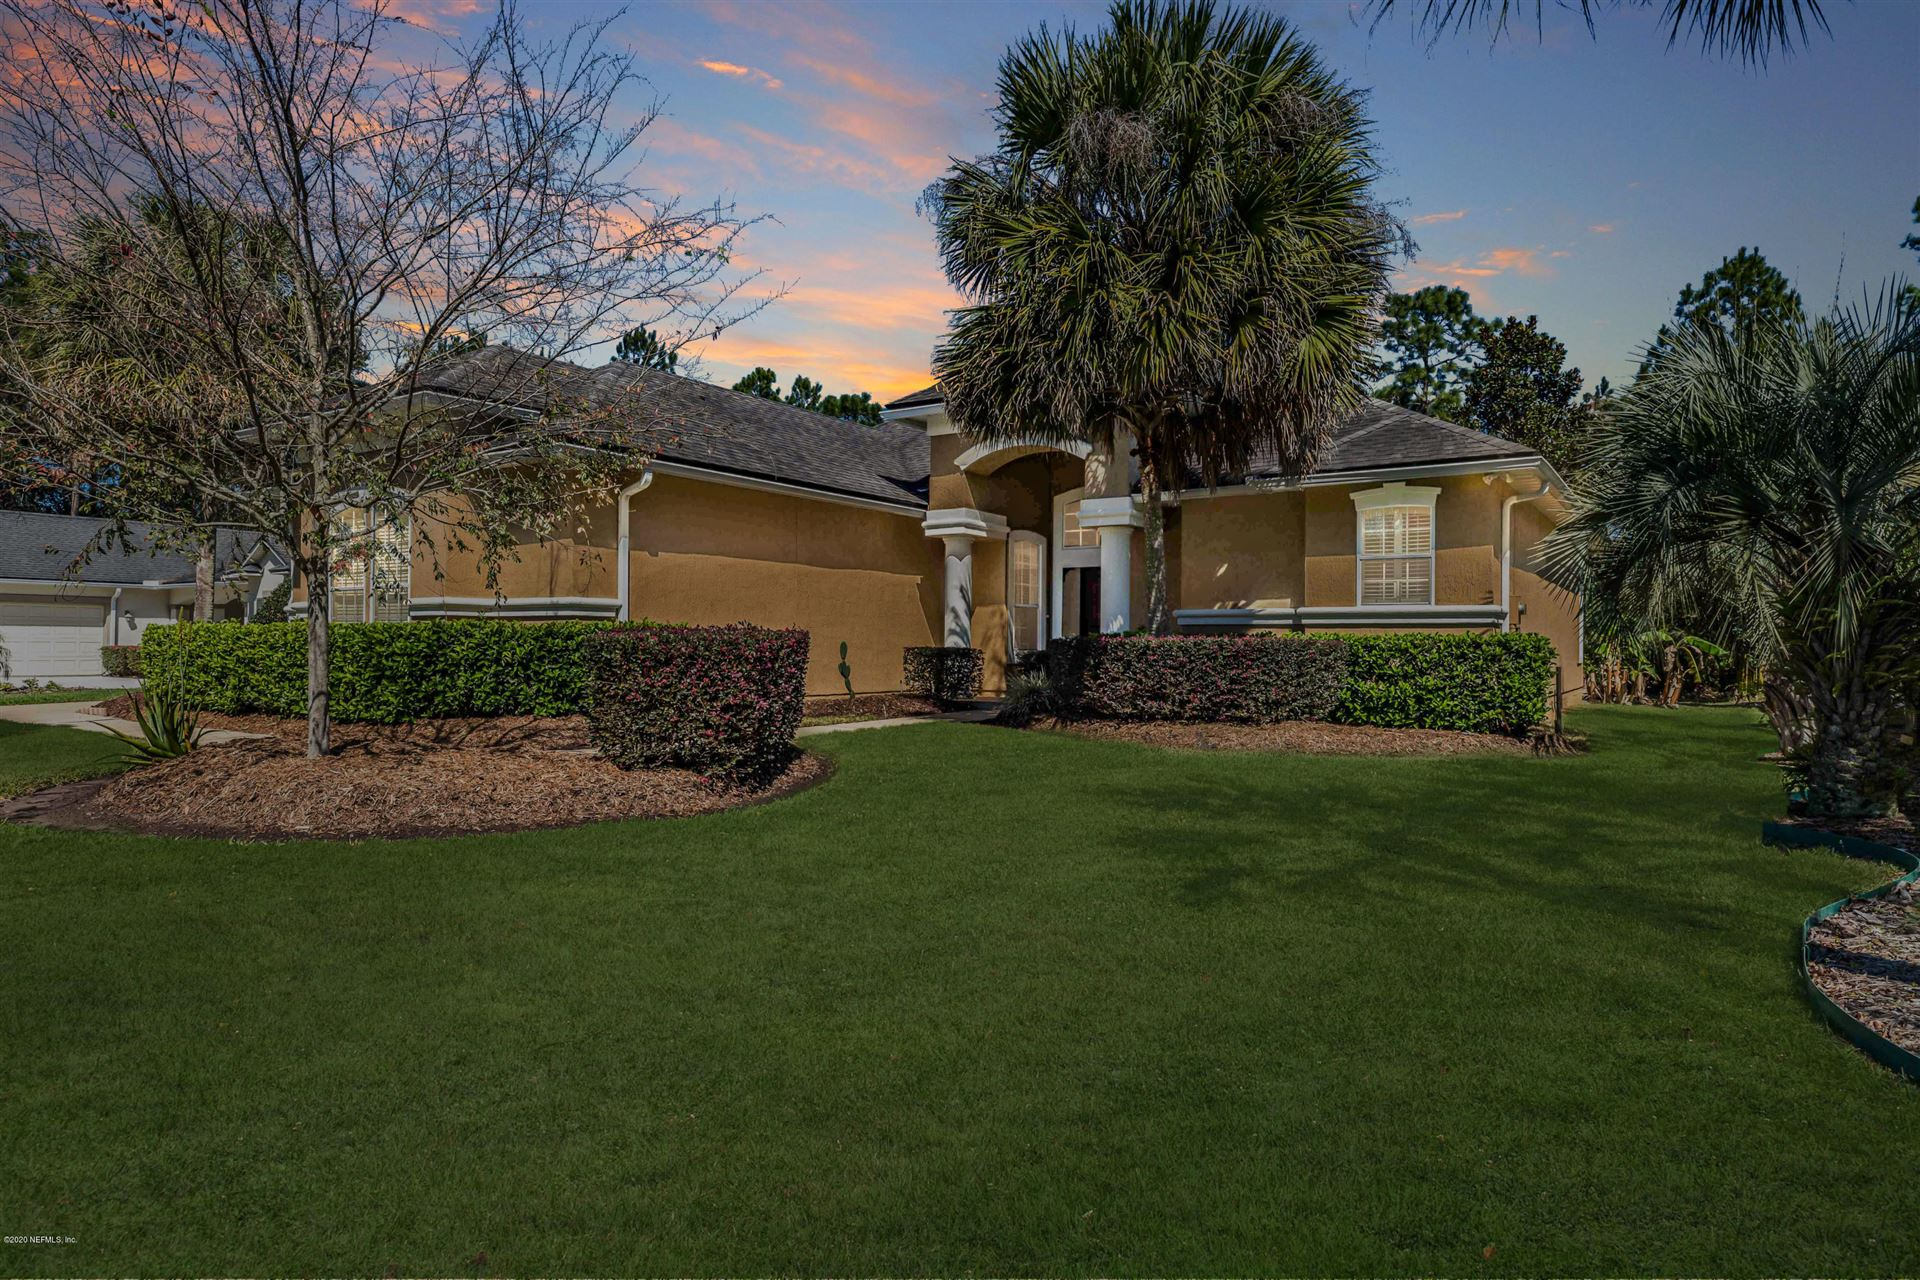 3608 BARTON CREEK CIR, Green Cove Springs, FL 32043 - MLS#: 1055148